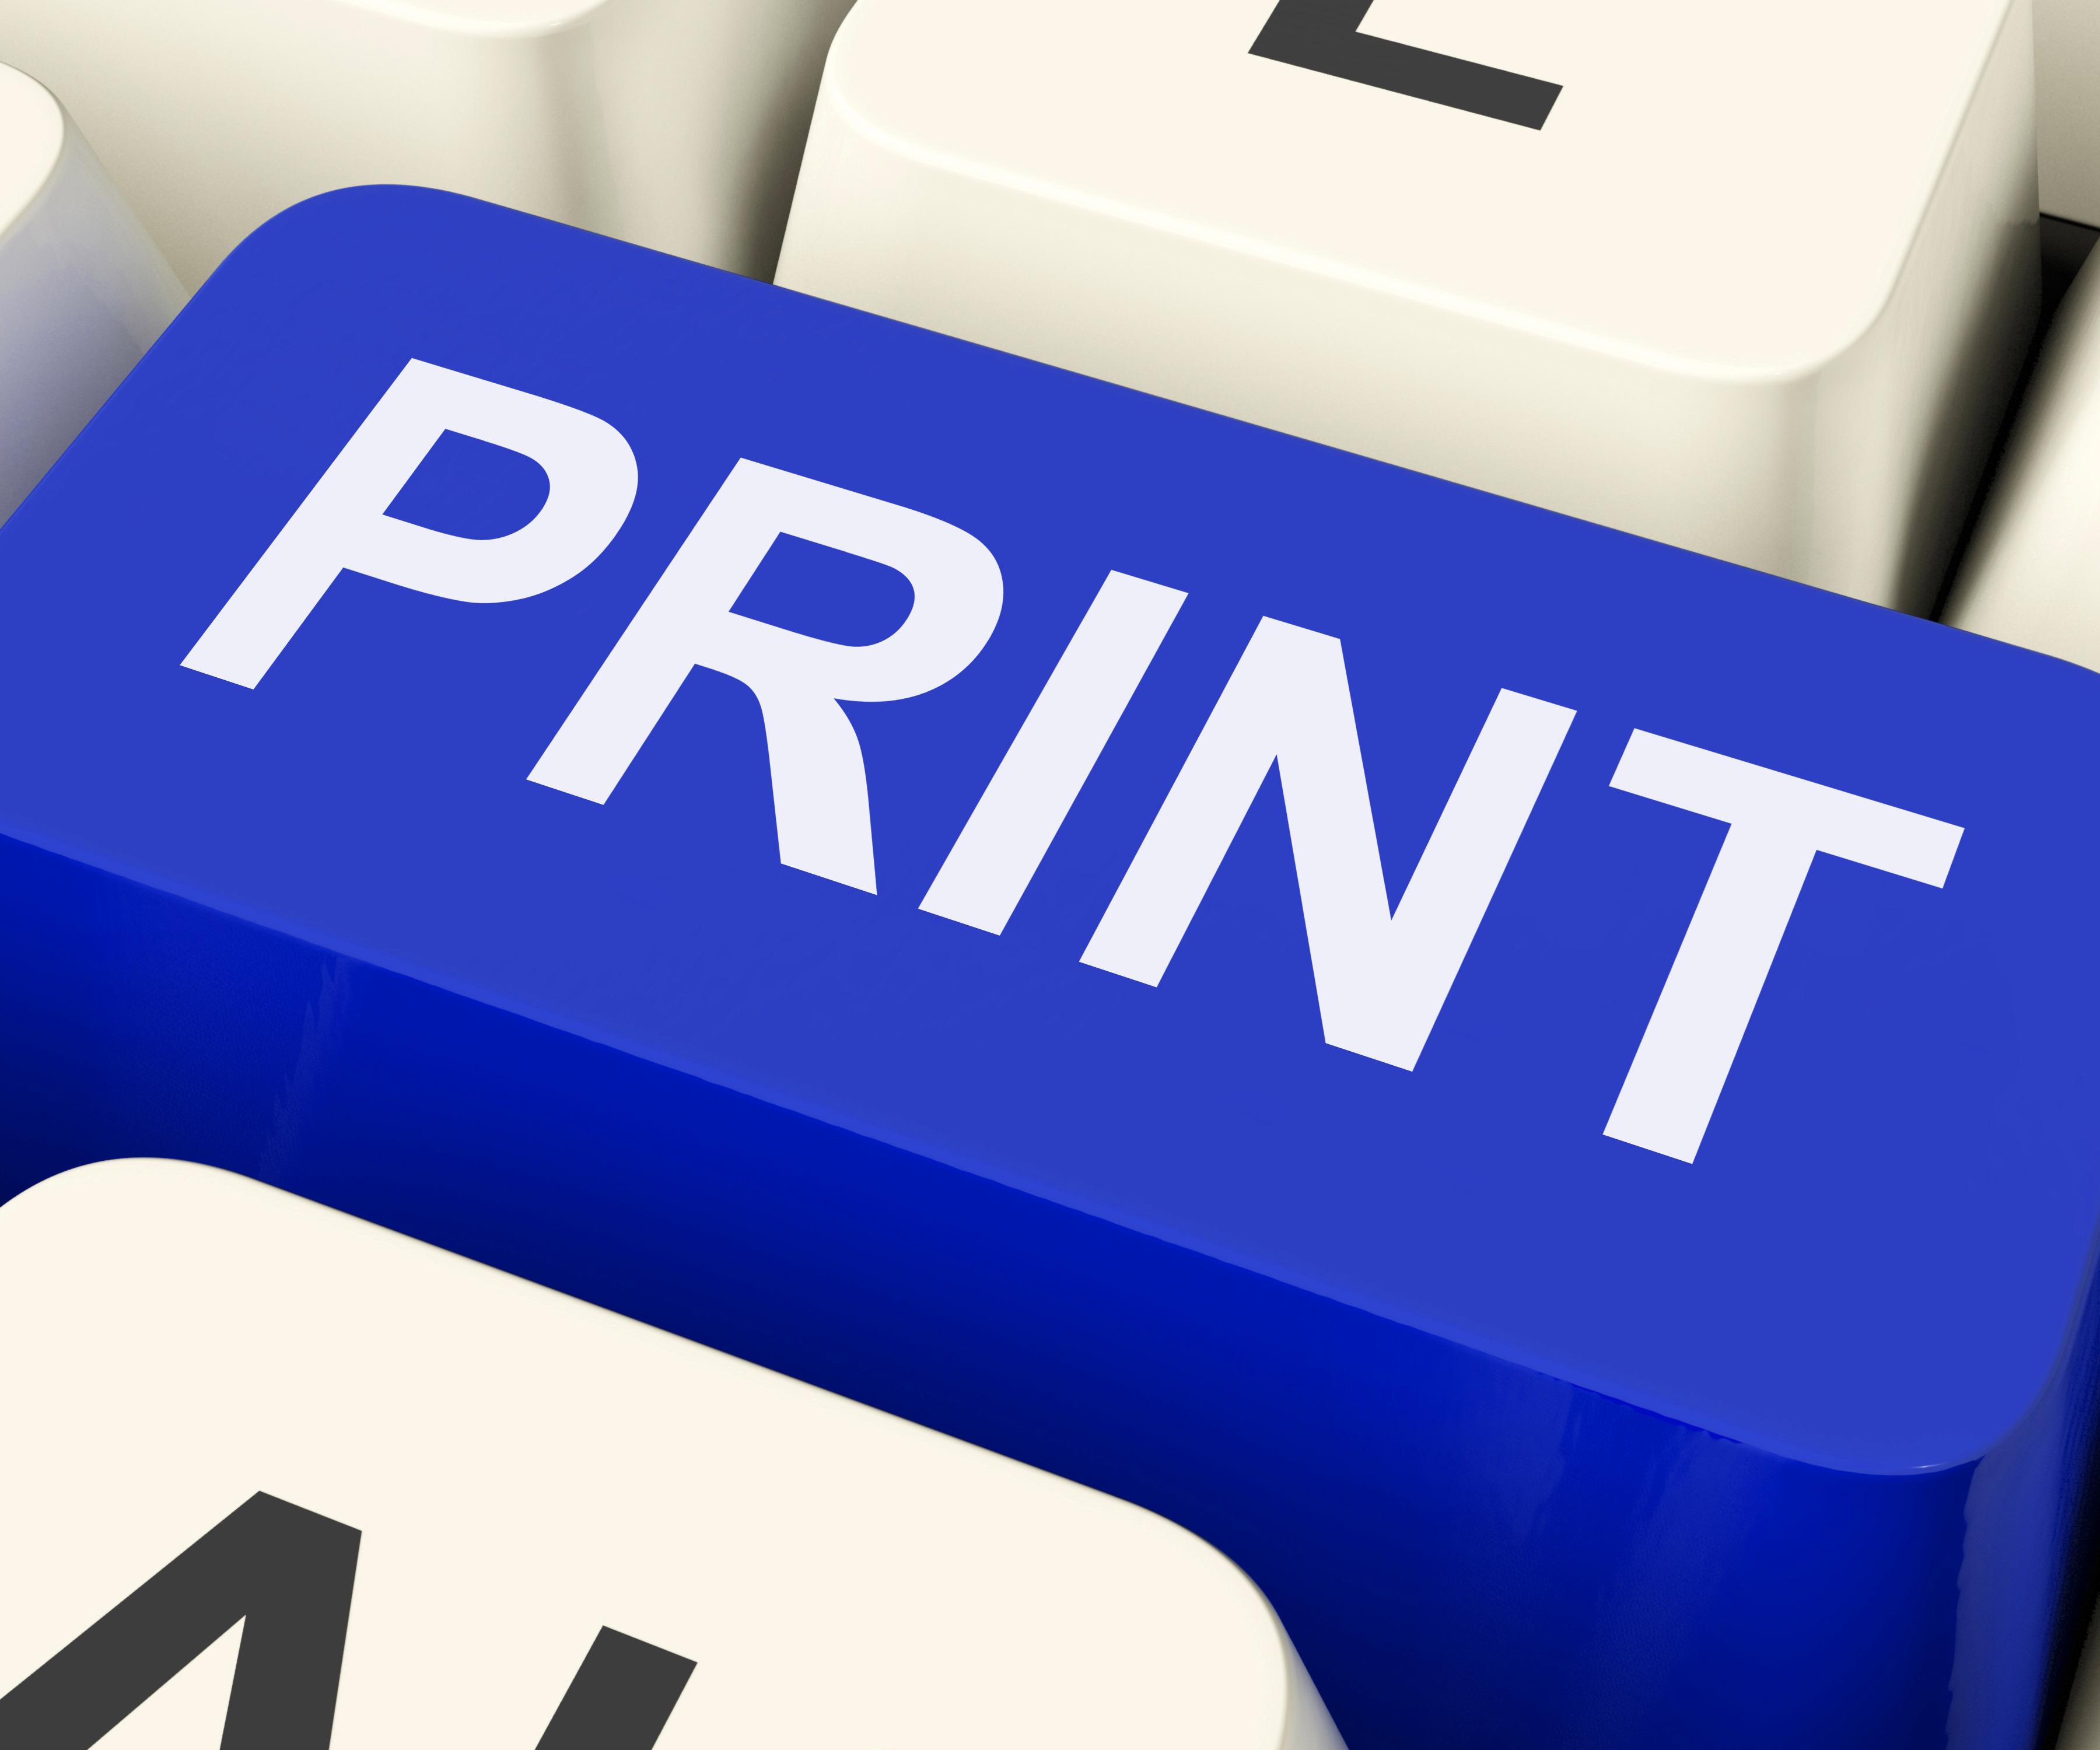 print key shows printer printing or printout zke1H4vO